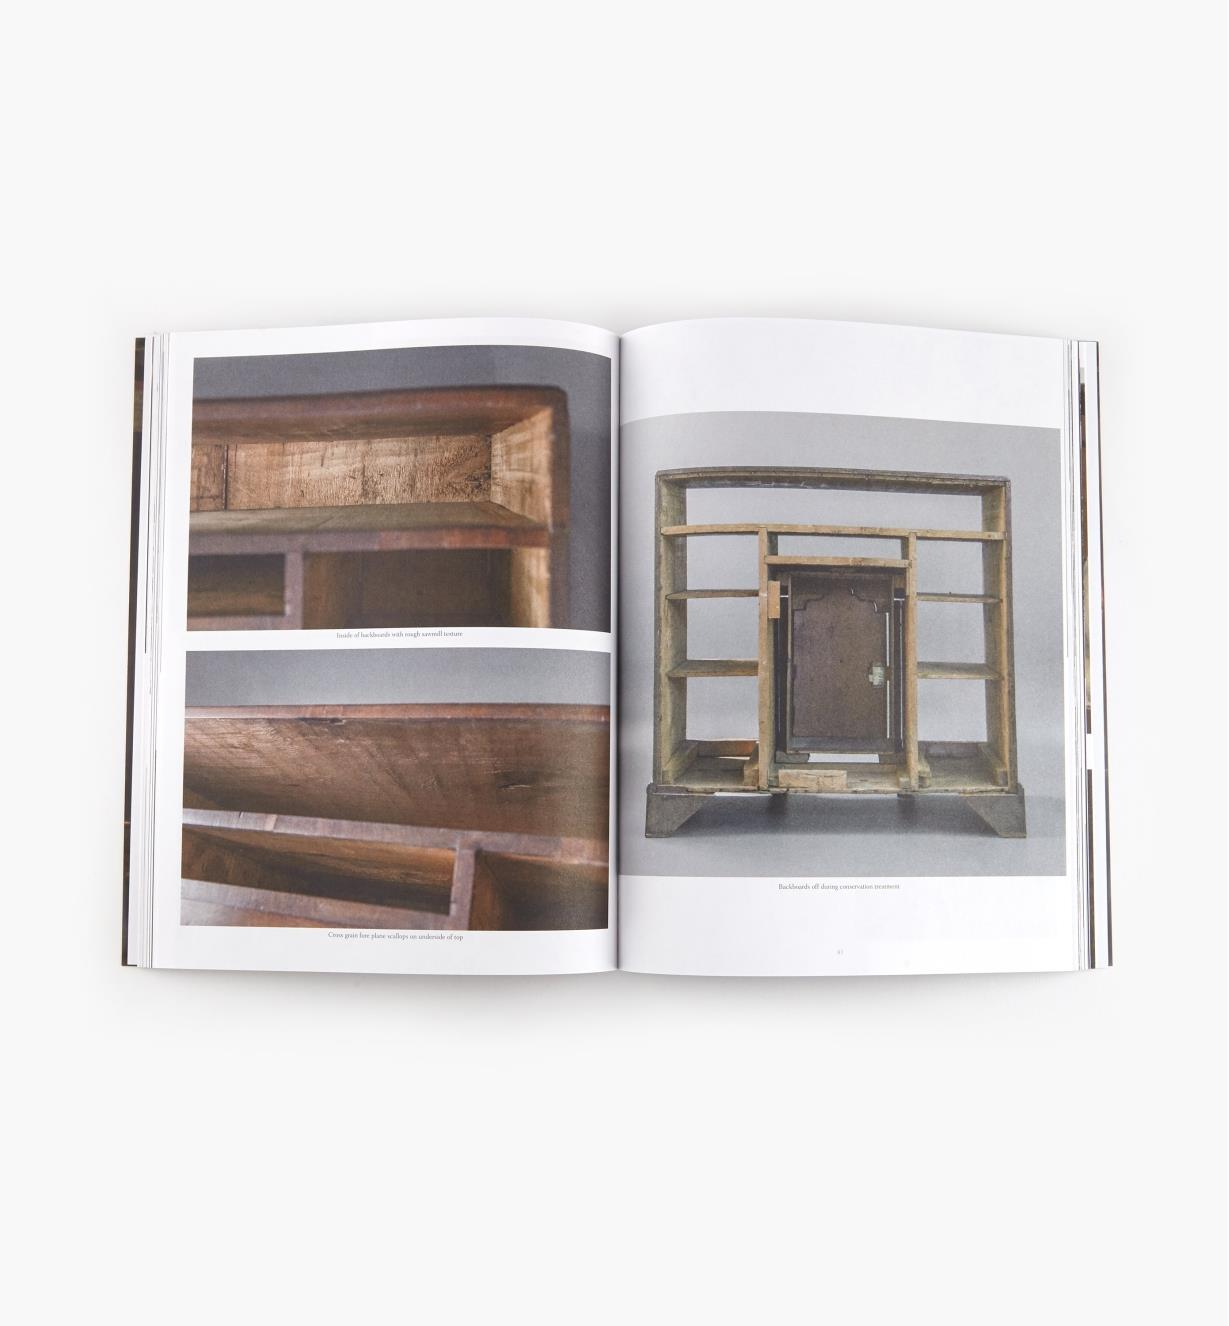 42L9514 - Mortise & Tenon Magazine, Issue 4